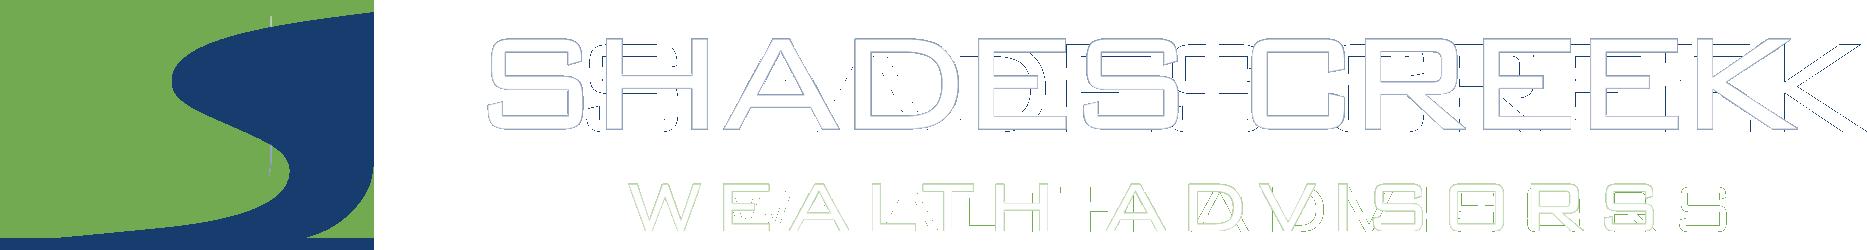 Shadow Creek Wealth Advisors logo Birmingham, AL Shades Creek Wealth Advisors